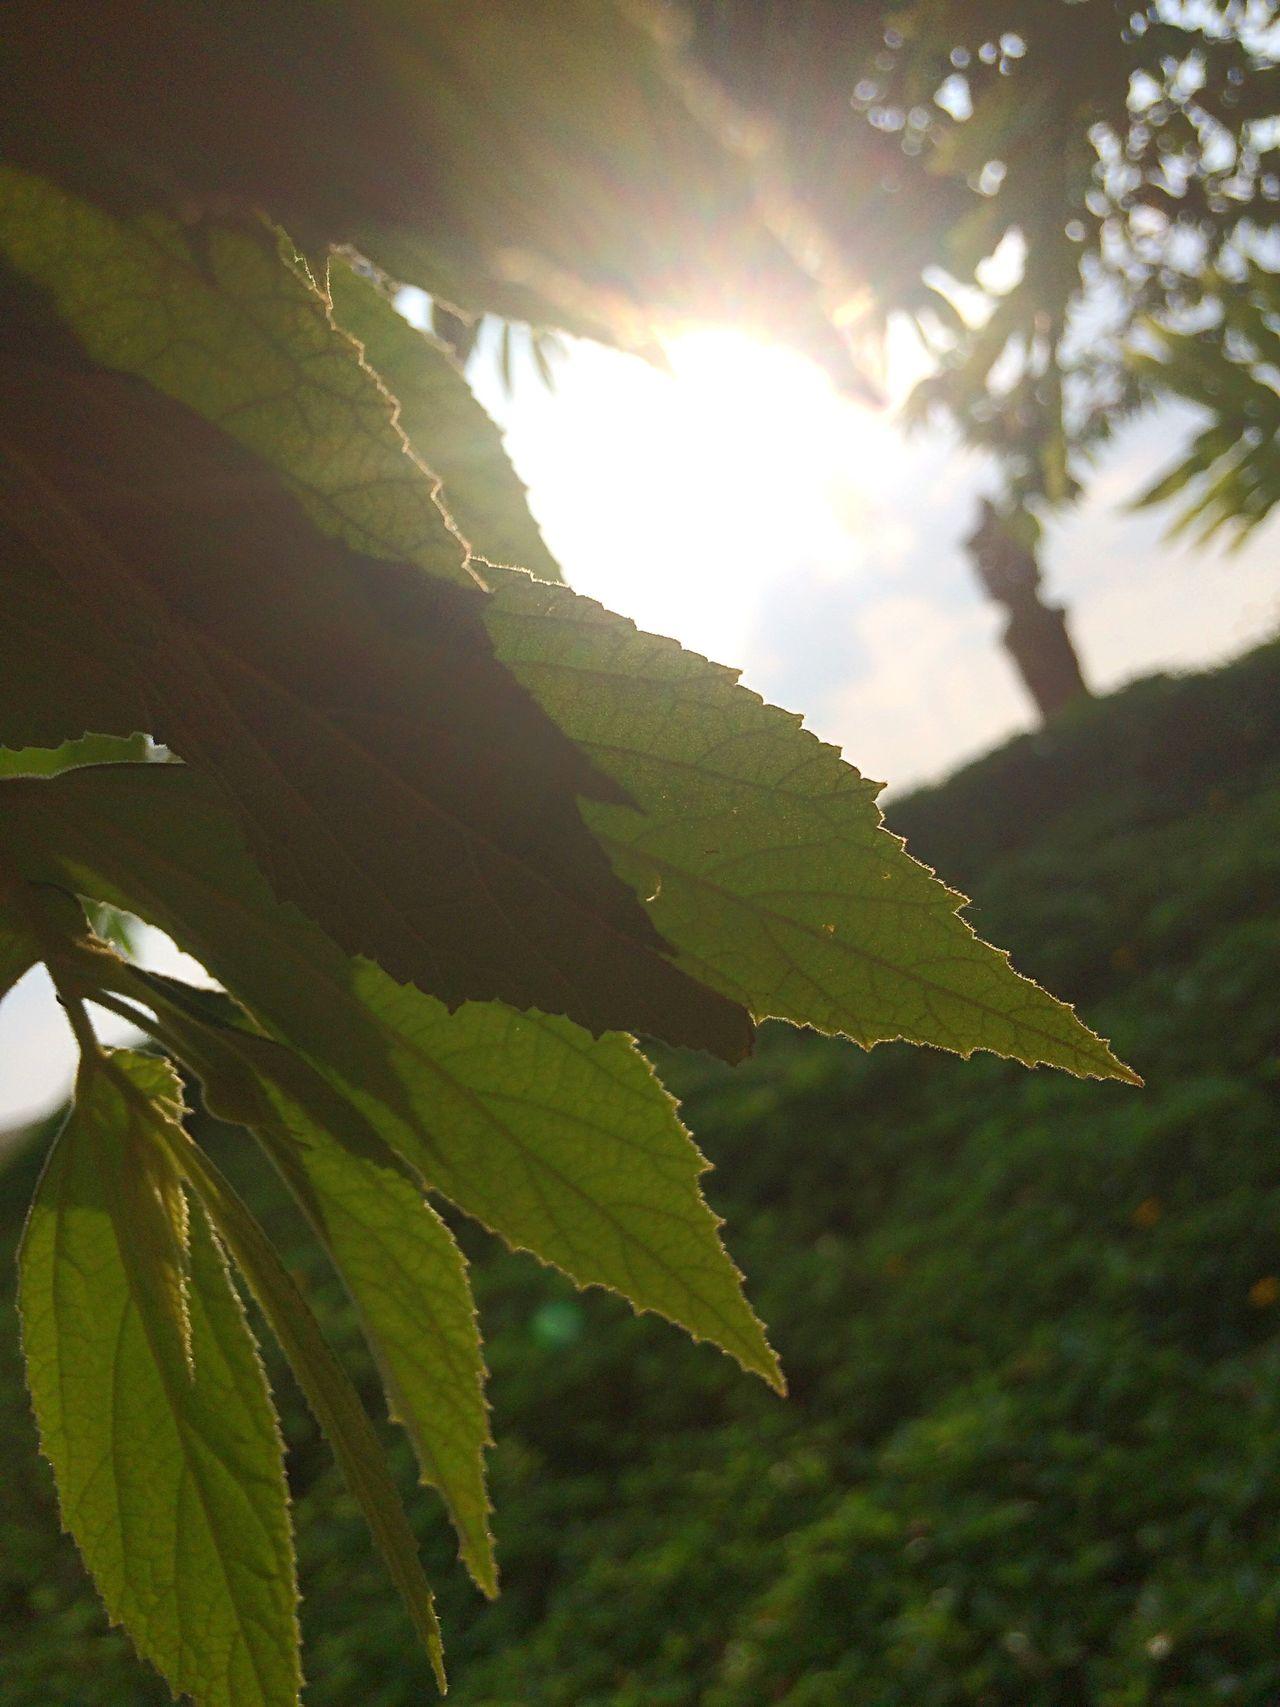 Sun Glare Green Leaf Growth Focus Object Freshness